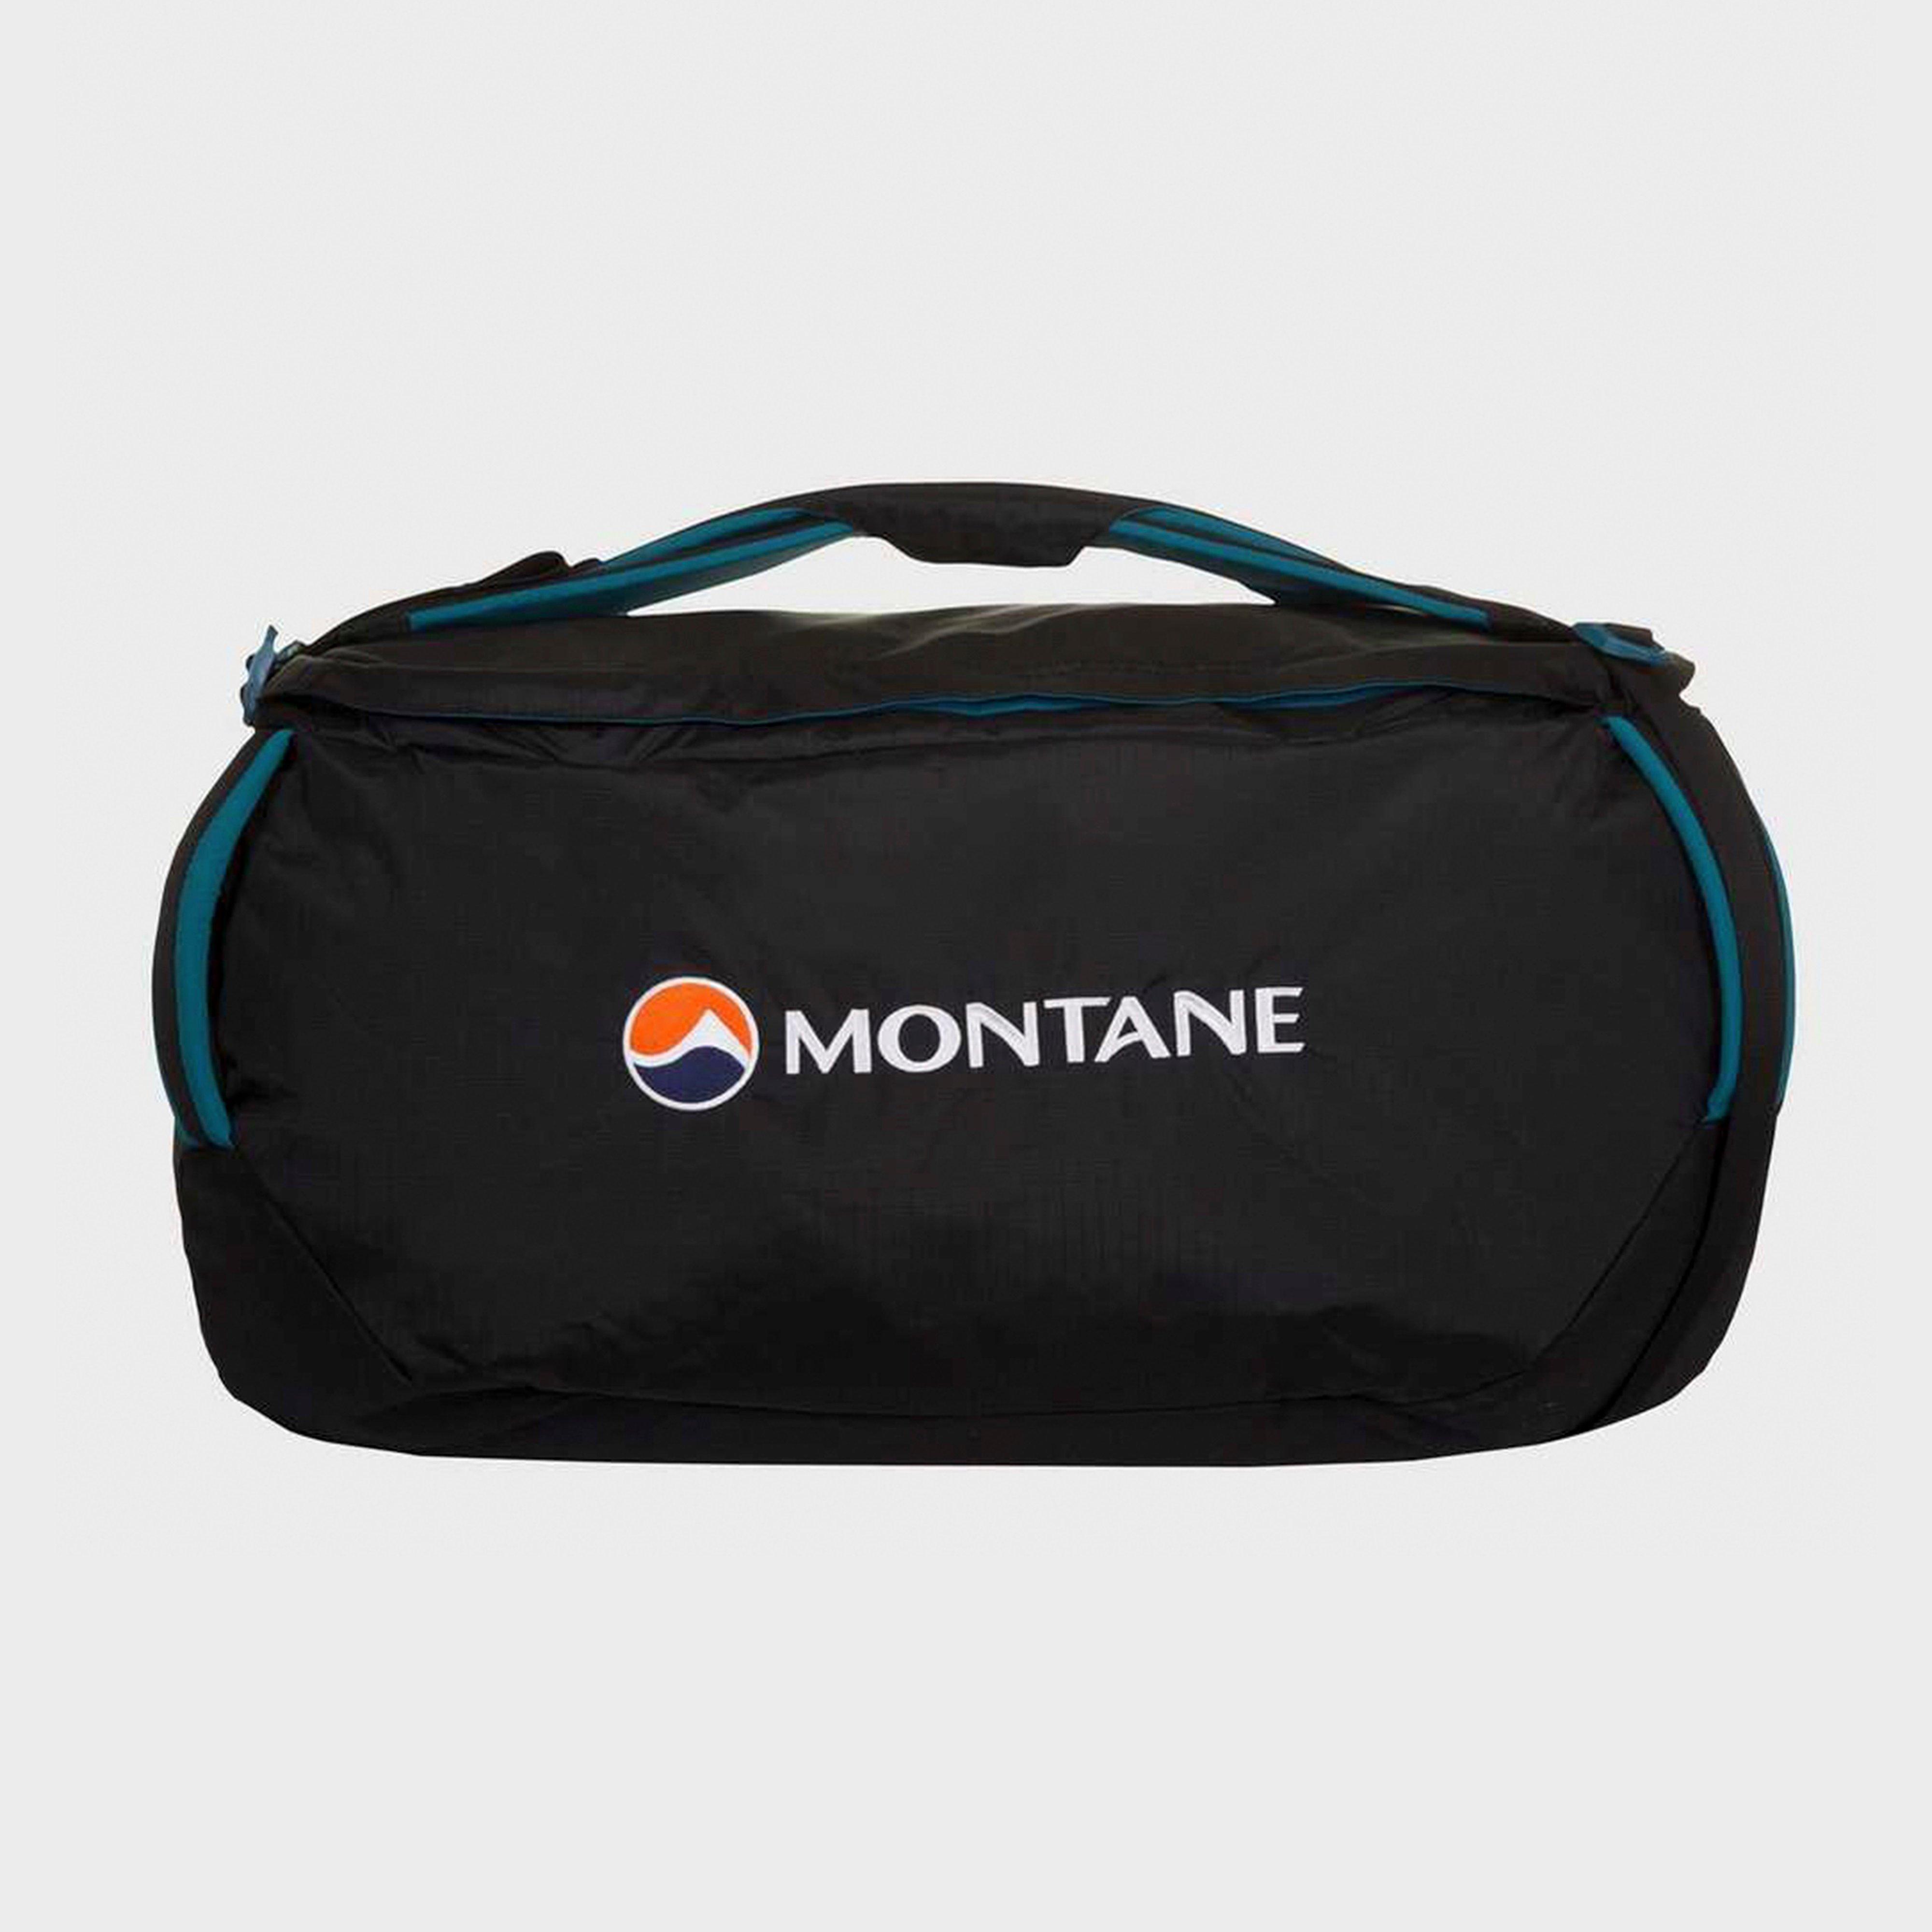 Montane Montane Transition 60 Holdall - Blue, Blue